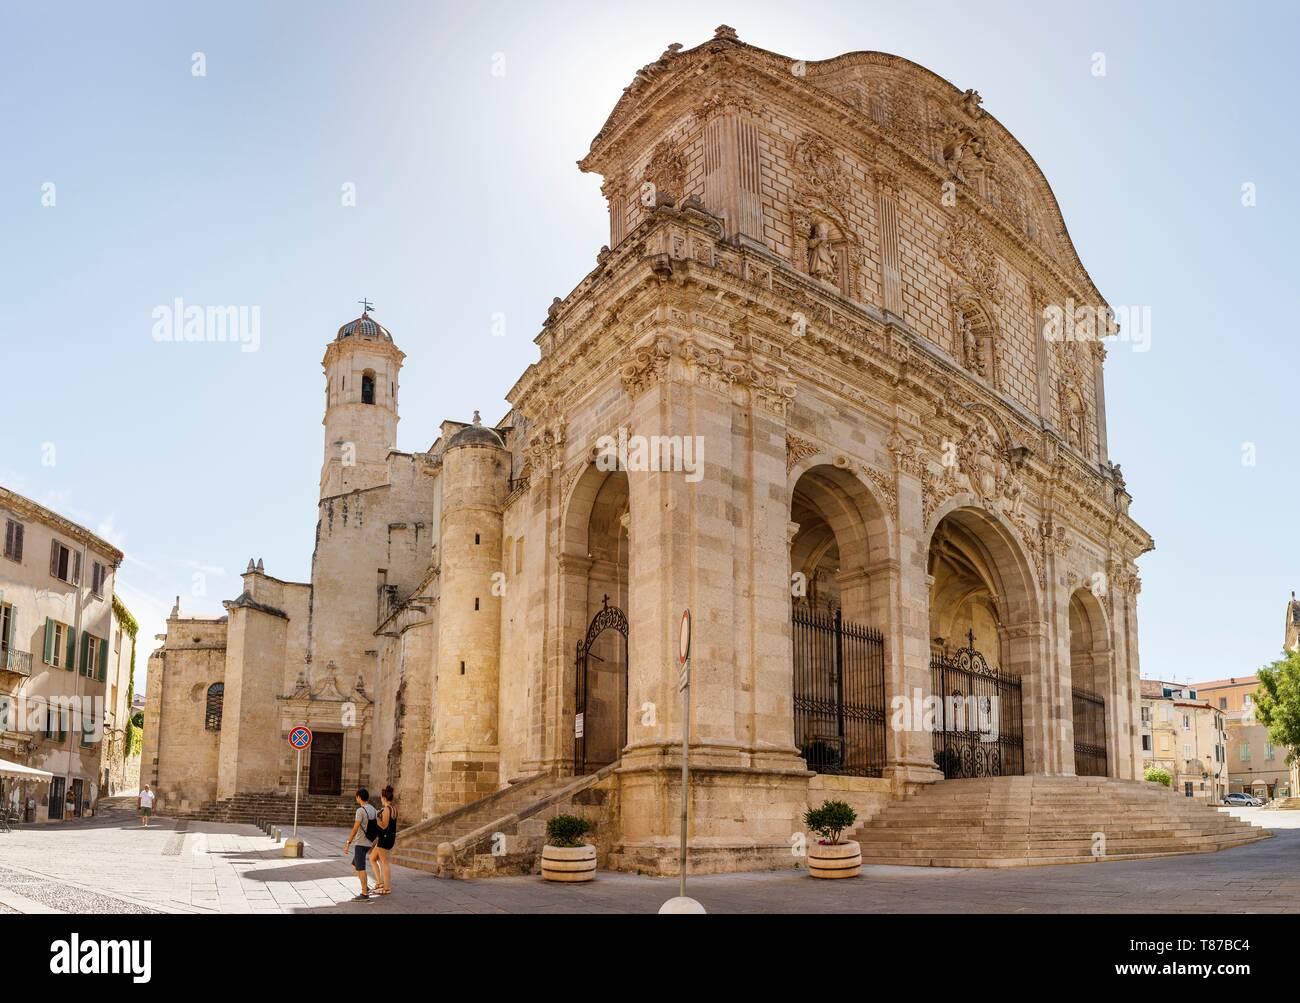 Italy, Sardinia, Sassari Province, Sassari, Il Duomo cathedral - Stock Image